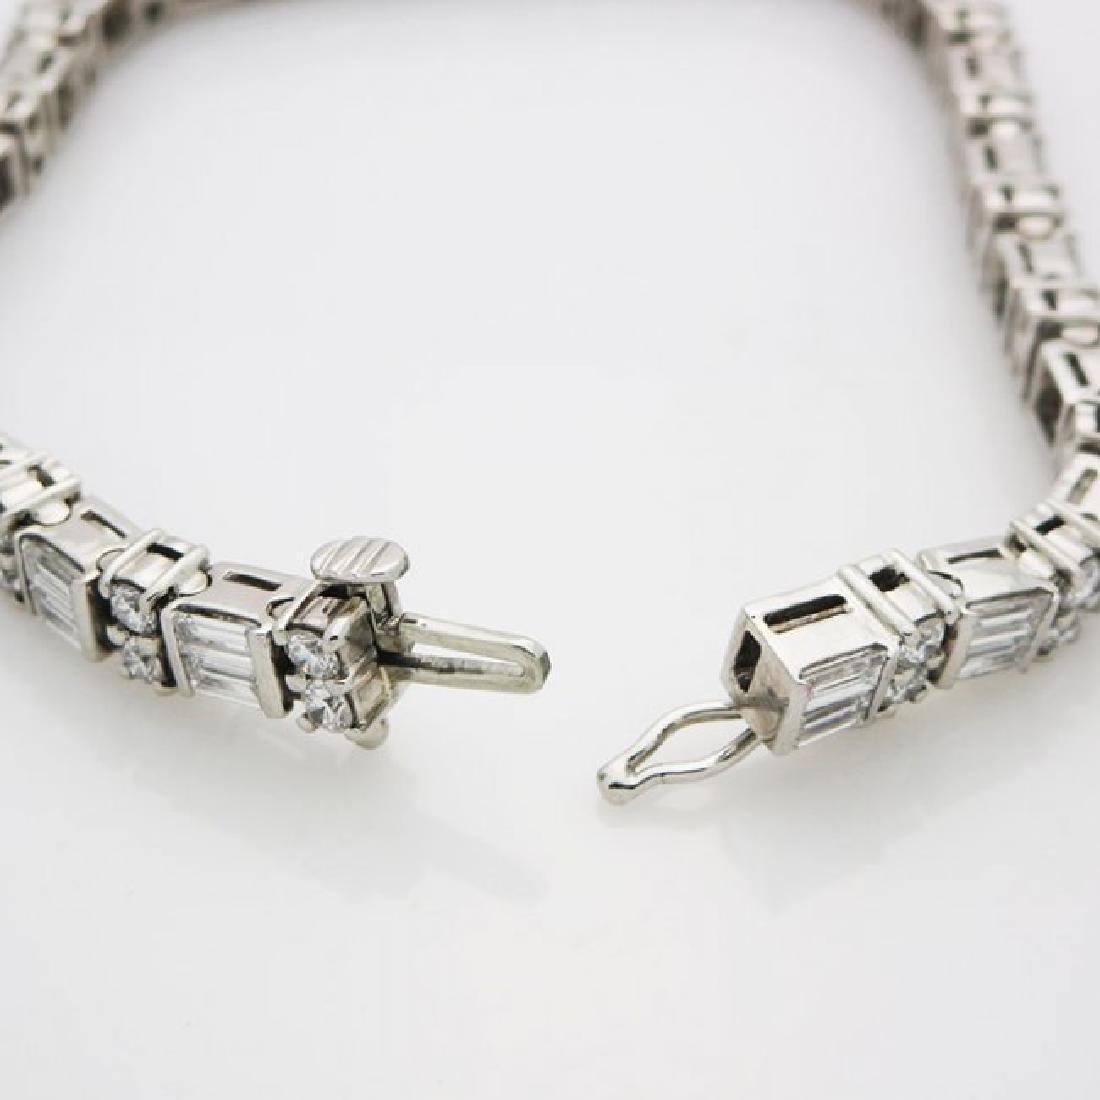 Estate 950 Platinum and apx 8CT VS/F Diamond Bracelet - 5